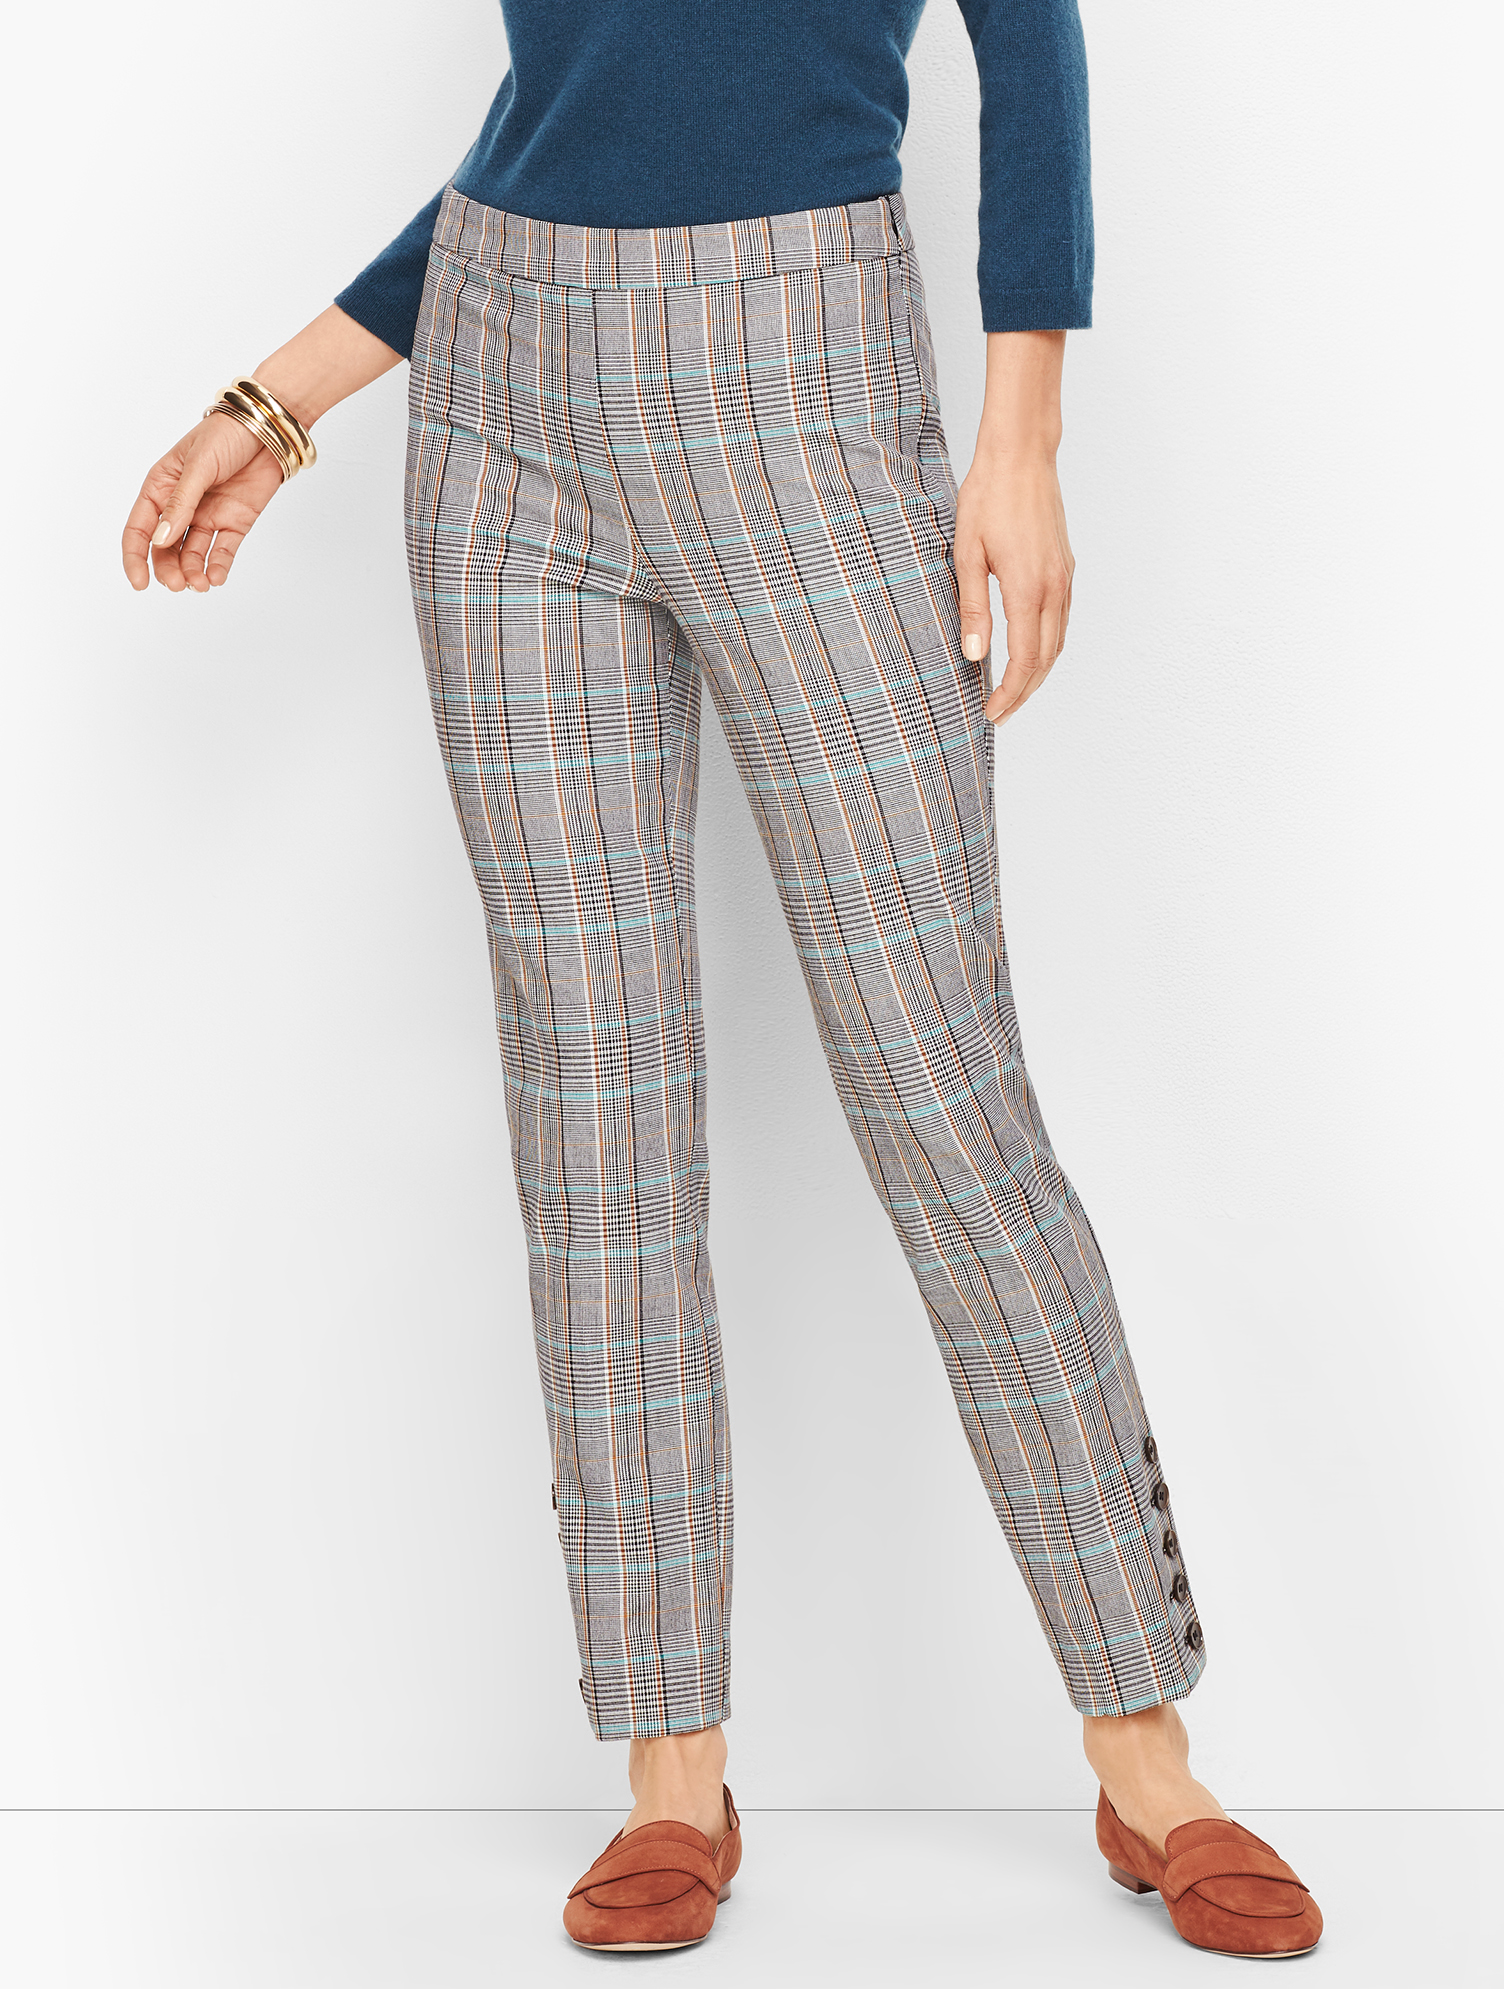 60s – 70s Pants, Jeans, Hippie, Bell Bottoms, Jumpsuits Talbots Chatham Button-Hem Ankle Pants - MacIntosh Plaid - Teal Blue - 12 $89.99 AT vintagedancer.com